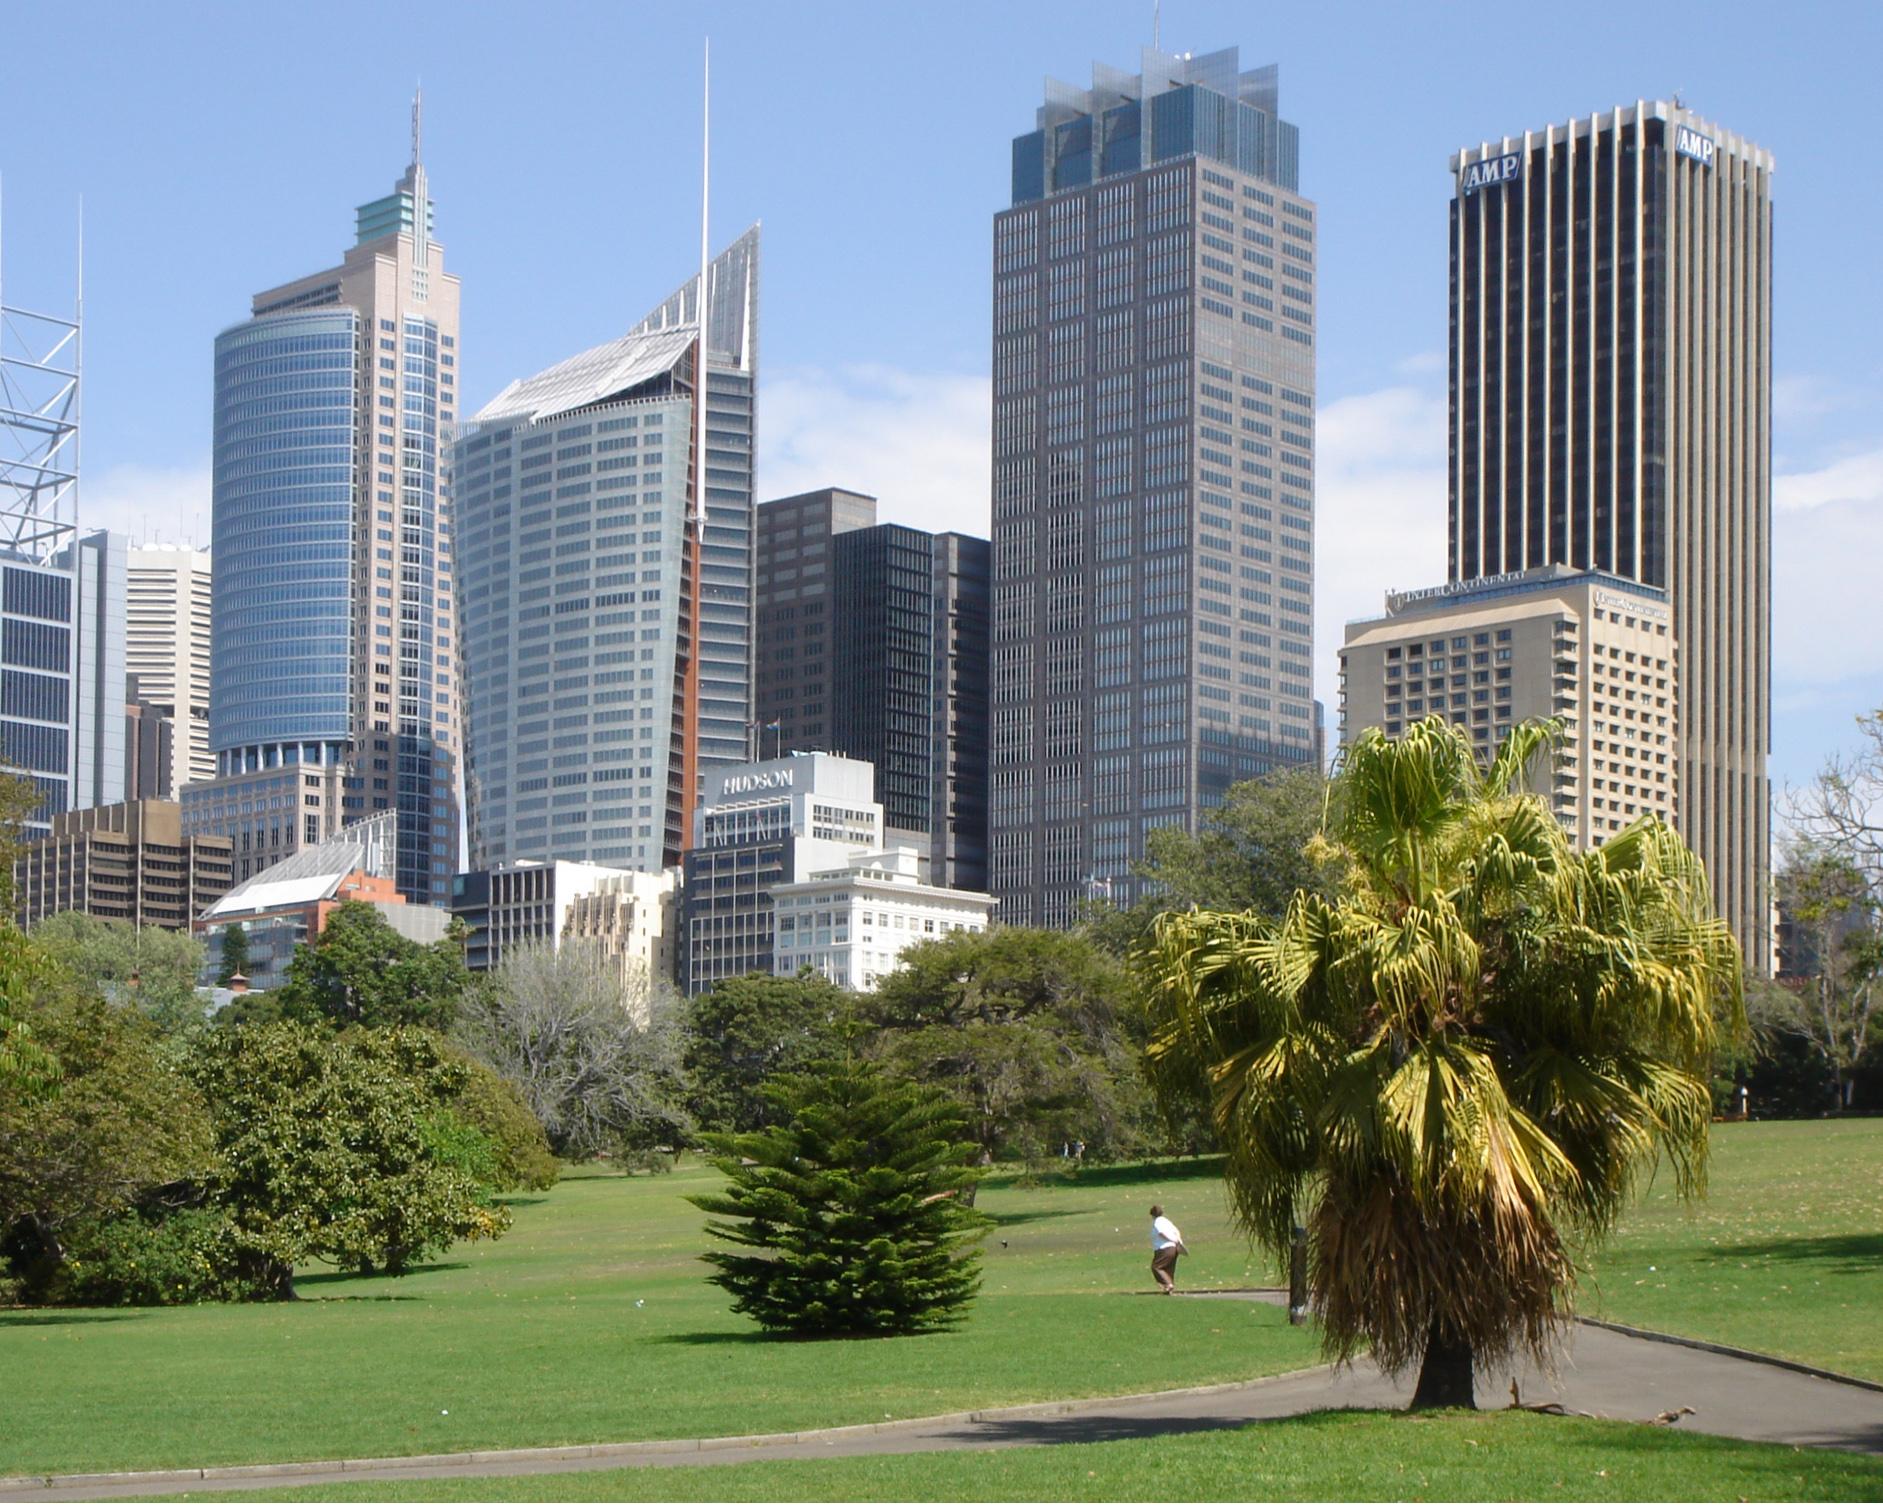 File:Botanical Gardens, Sydney, Australia 1